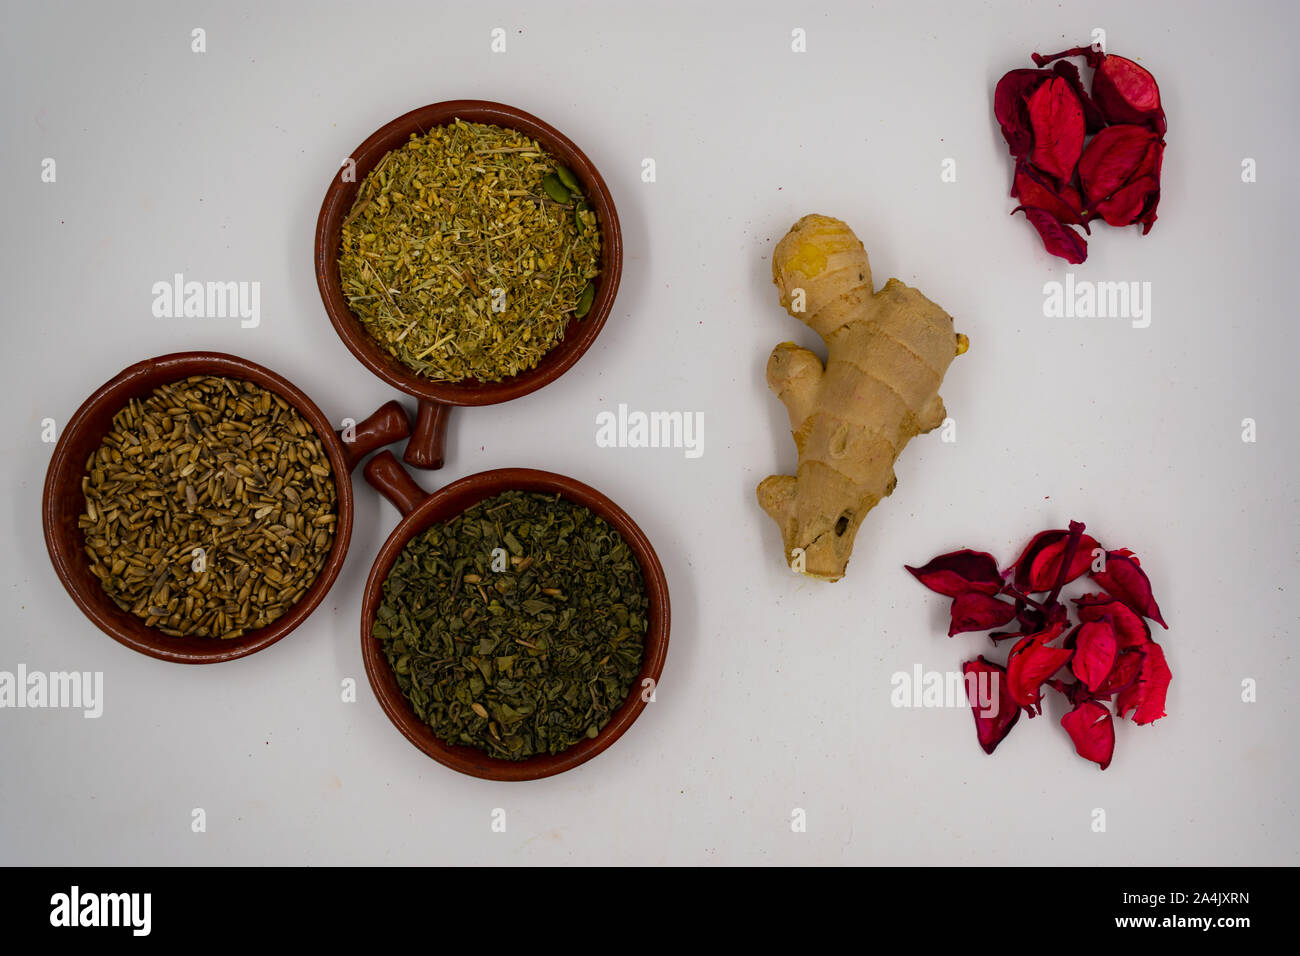 Kräuter der traditionellen Medizin, Naturheilkunde Stockfoto